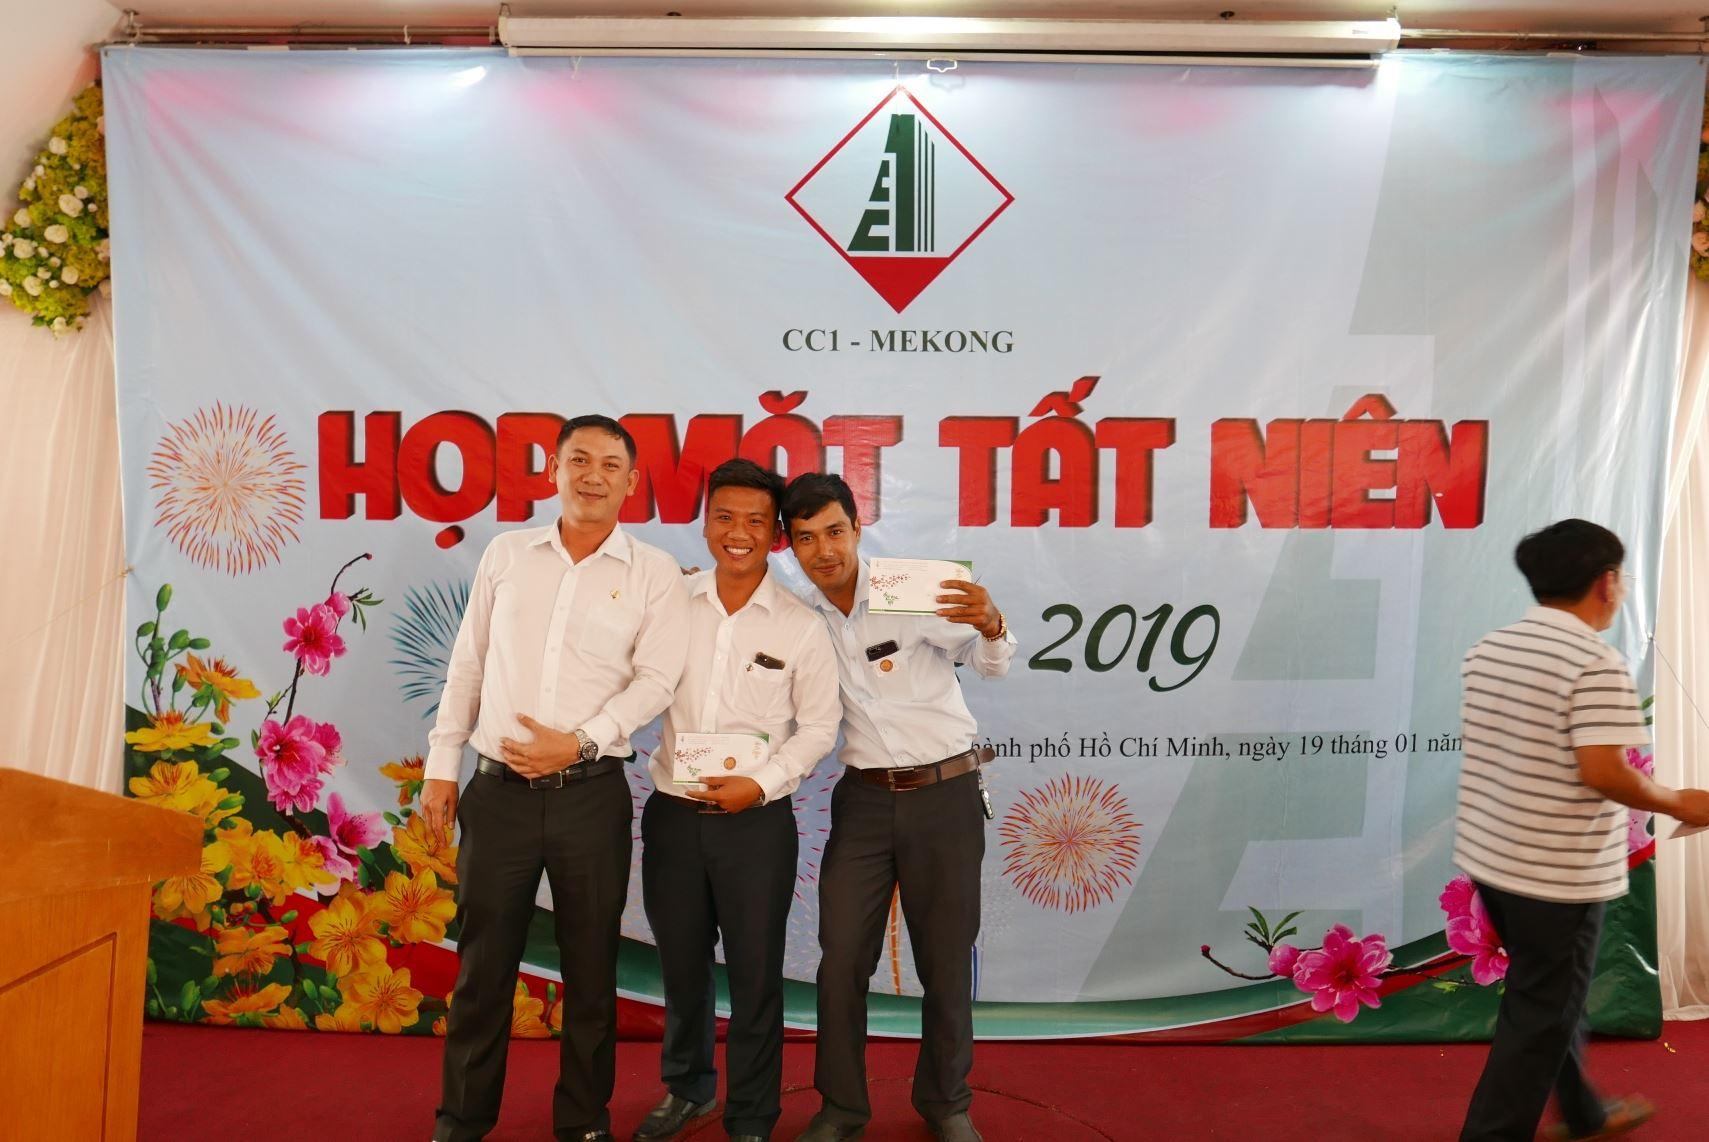 tat-nien-2019-cc1-mekong (31)